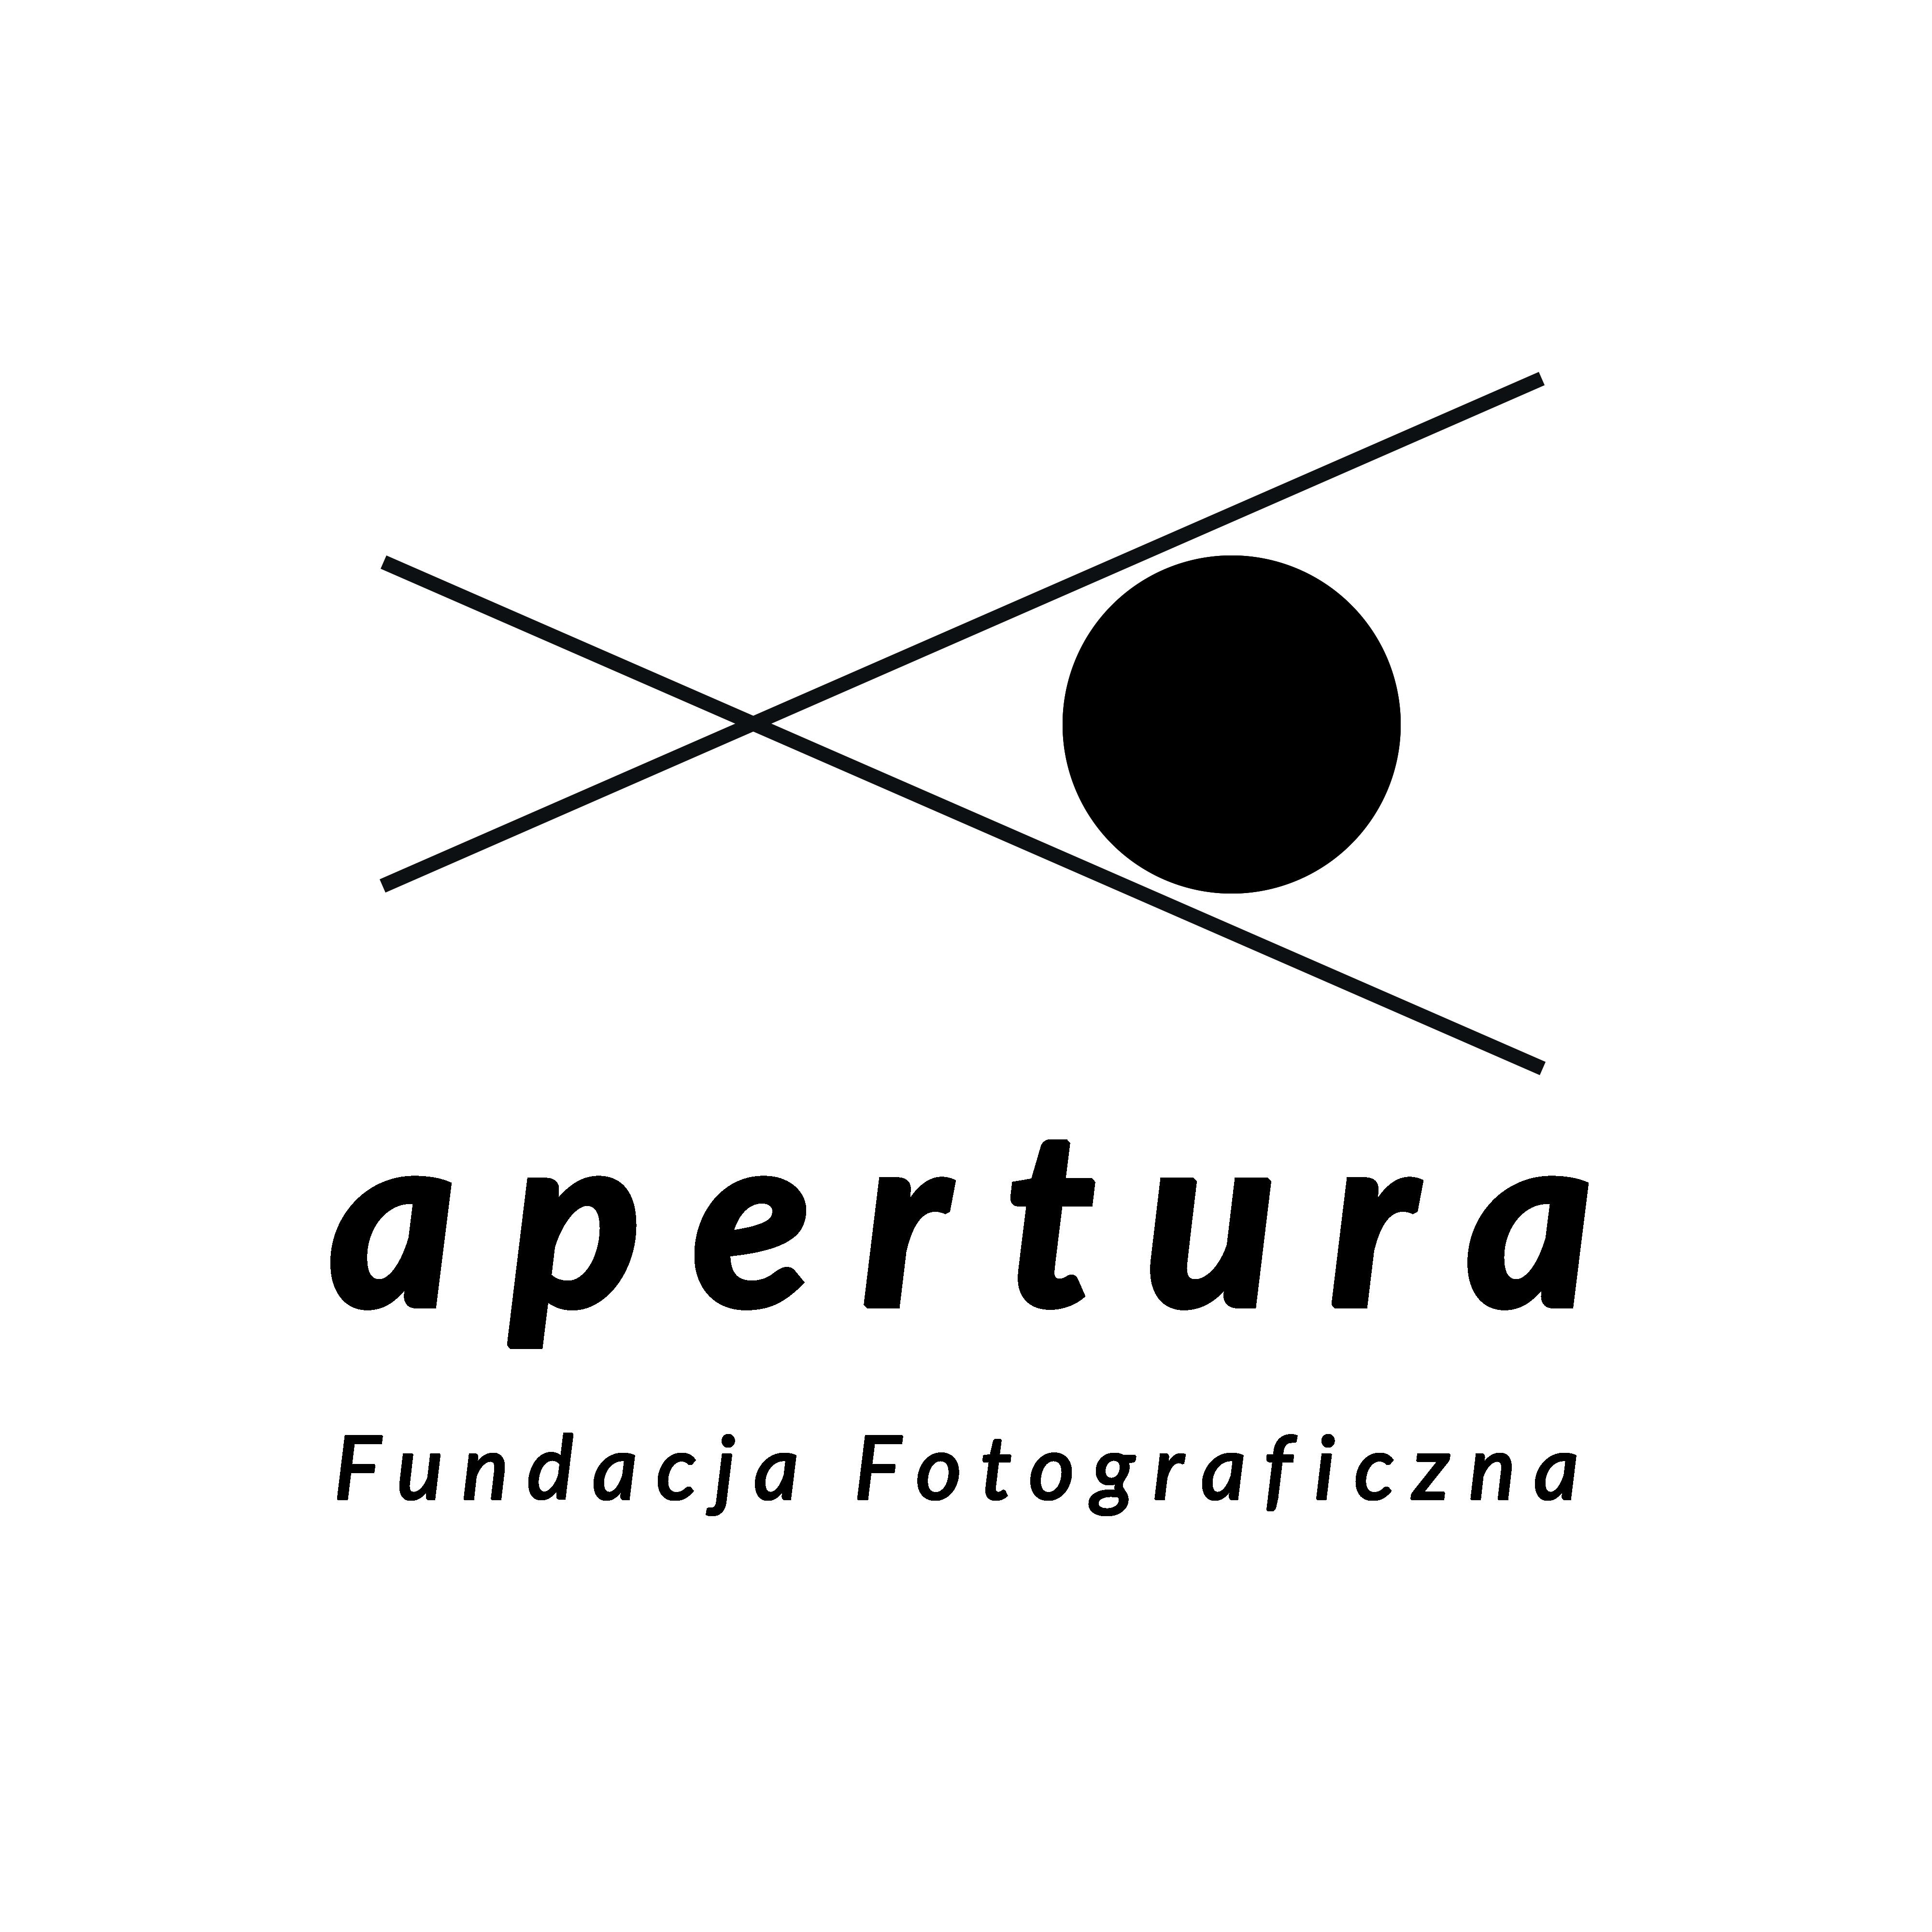 Logotyp Fundacja Fotograficzna Apertura - large white